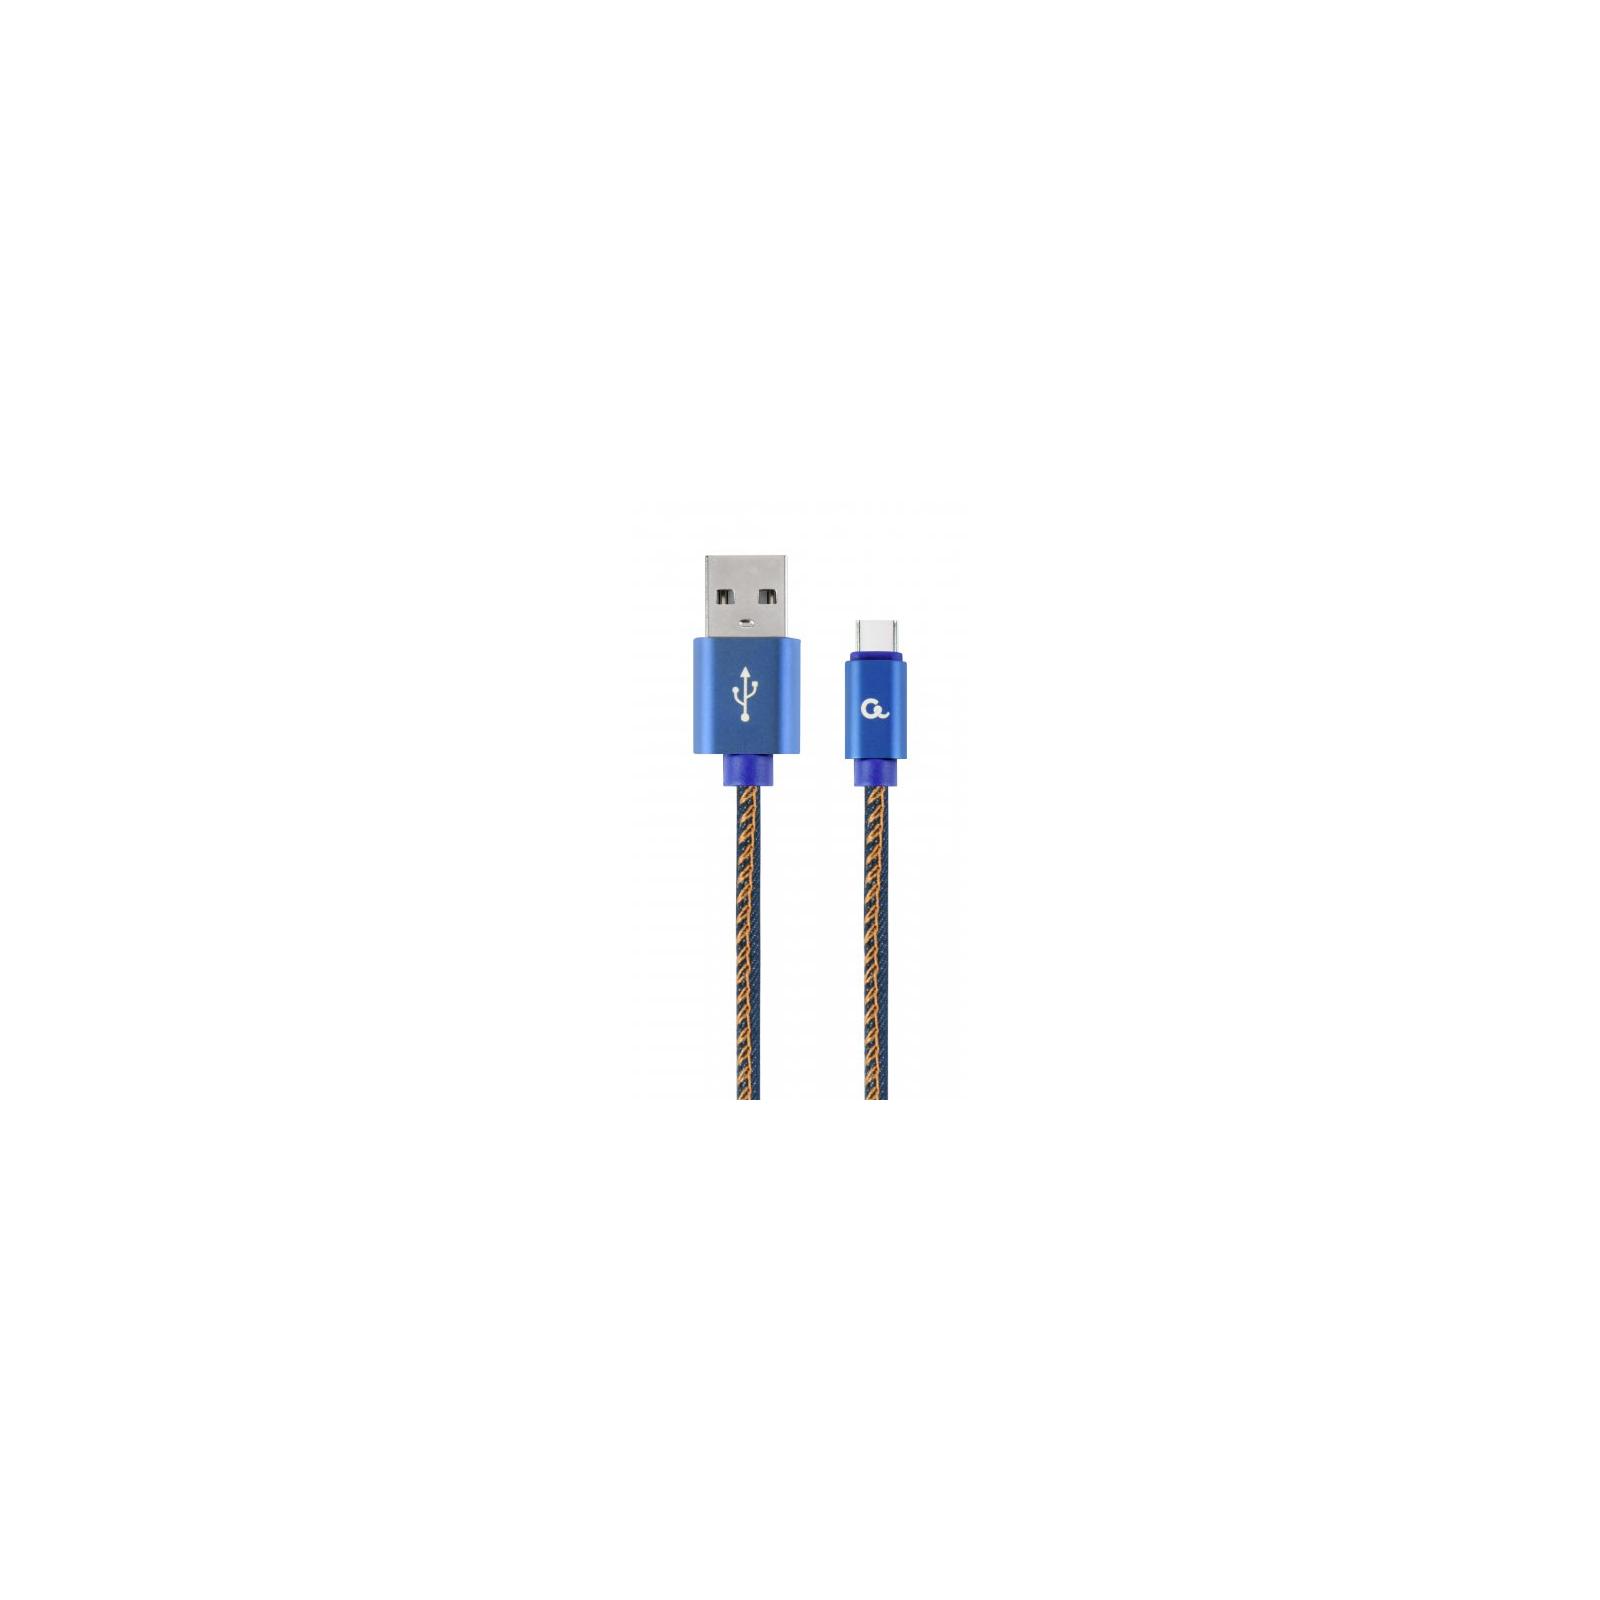 Дата кабель USB 2.0 AM to Type-C 1.0m Cablexpert (CC-USB2J-AMCM-1M-BL)